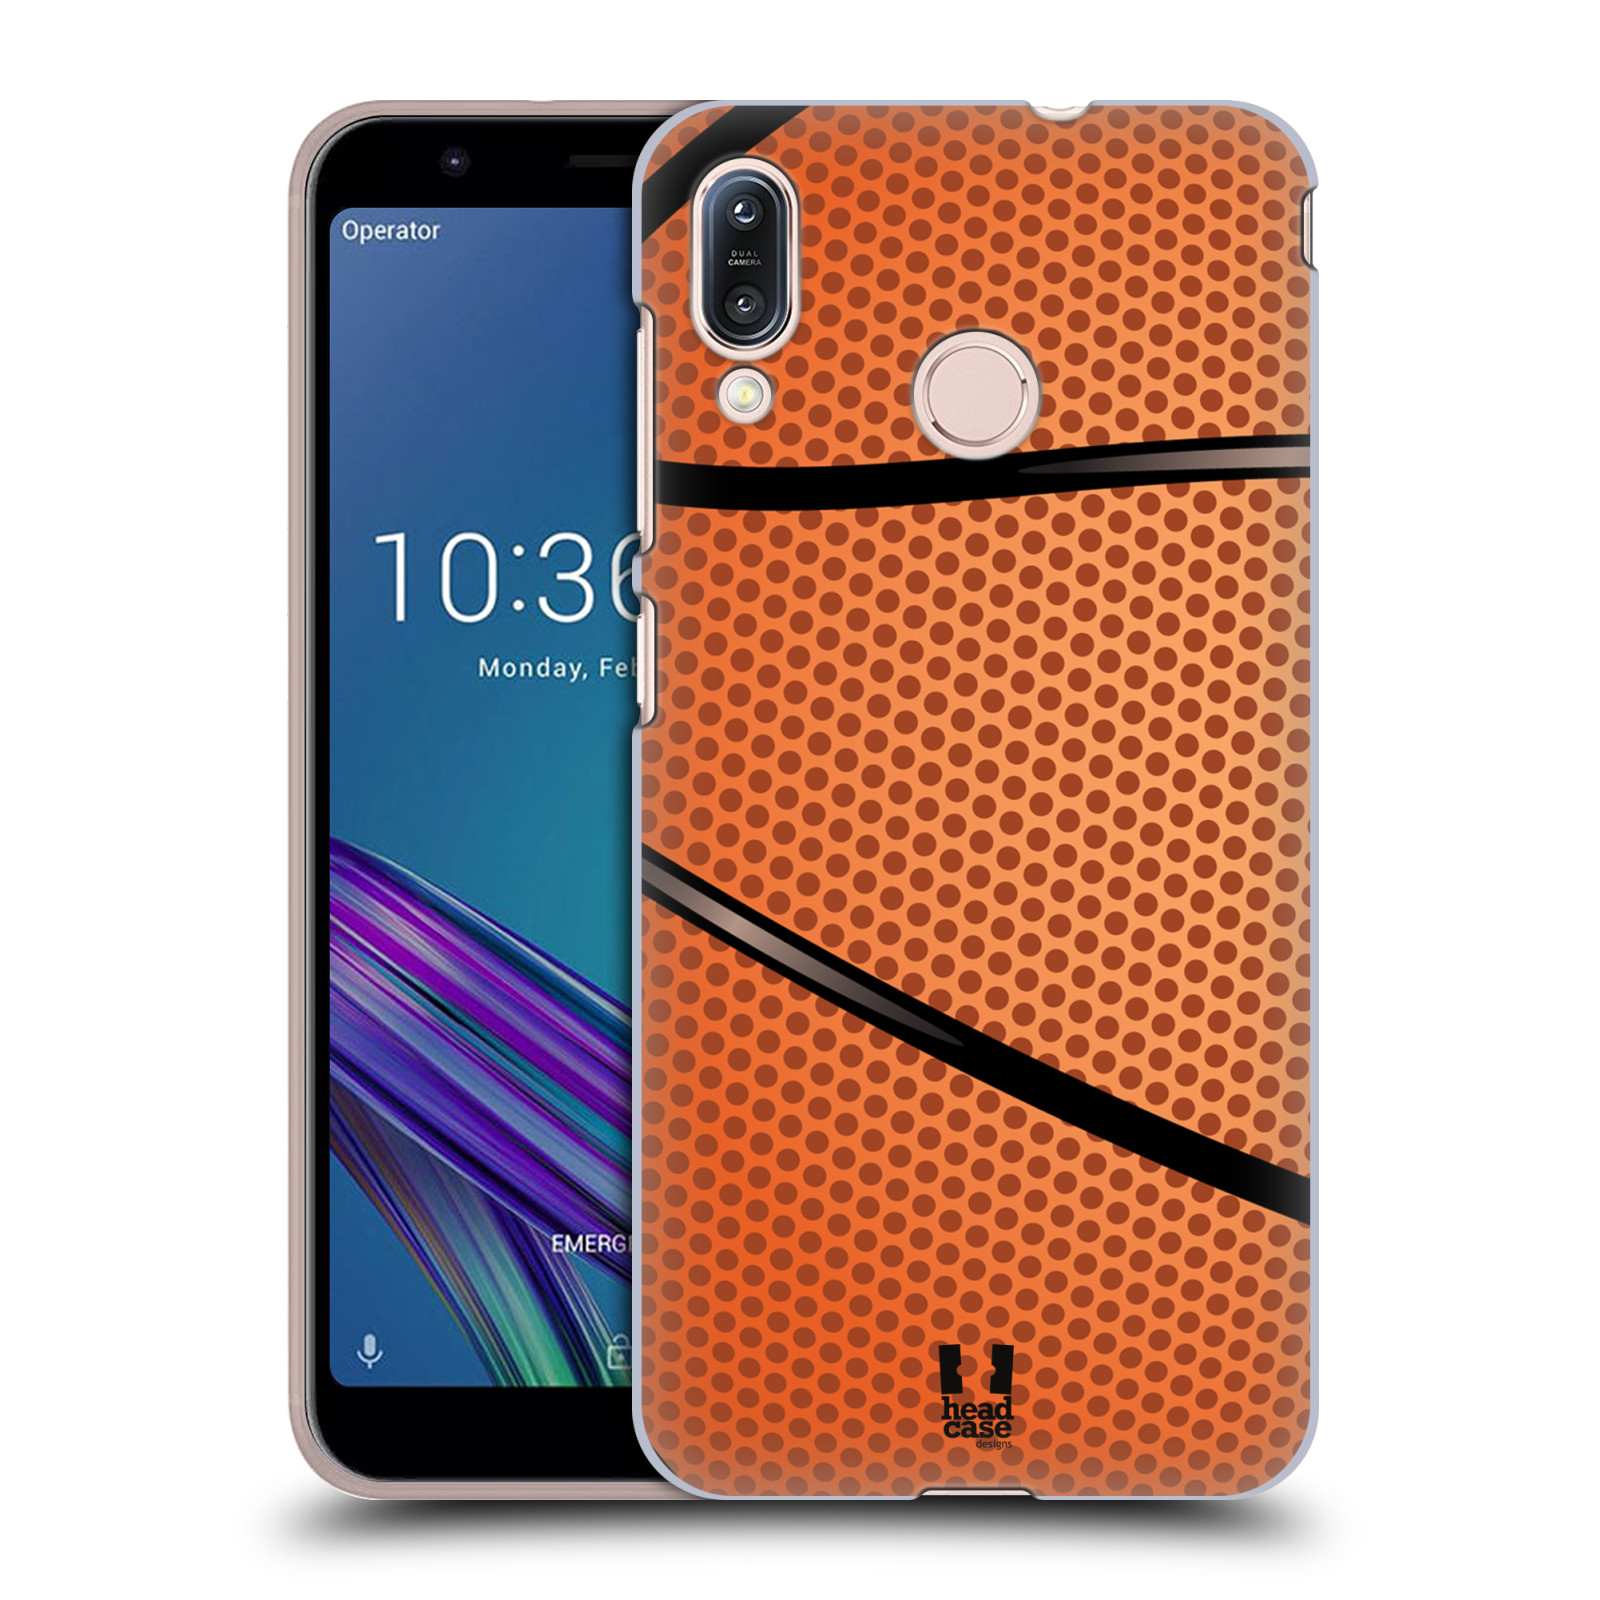 Plastové pouzdro na mobil Asus Zenfone Max M1 ZB555KL - Head Case - BASKEŤÁK